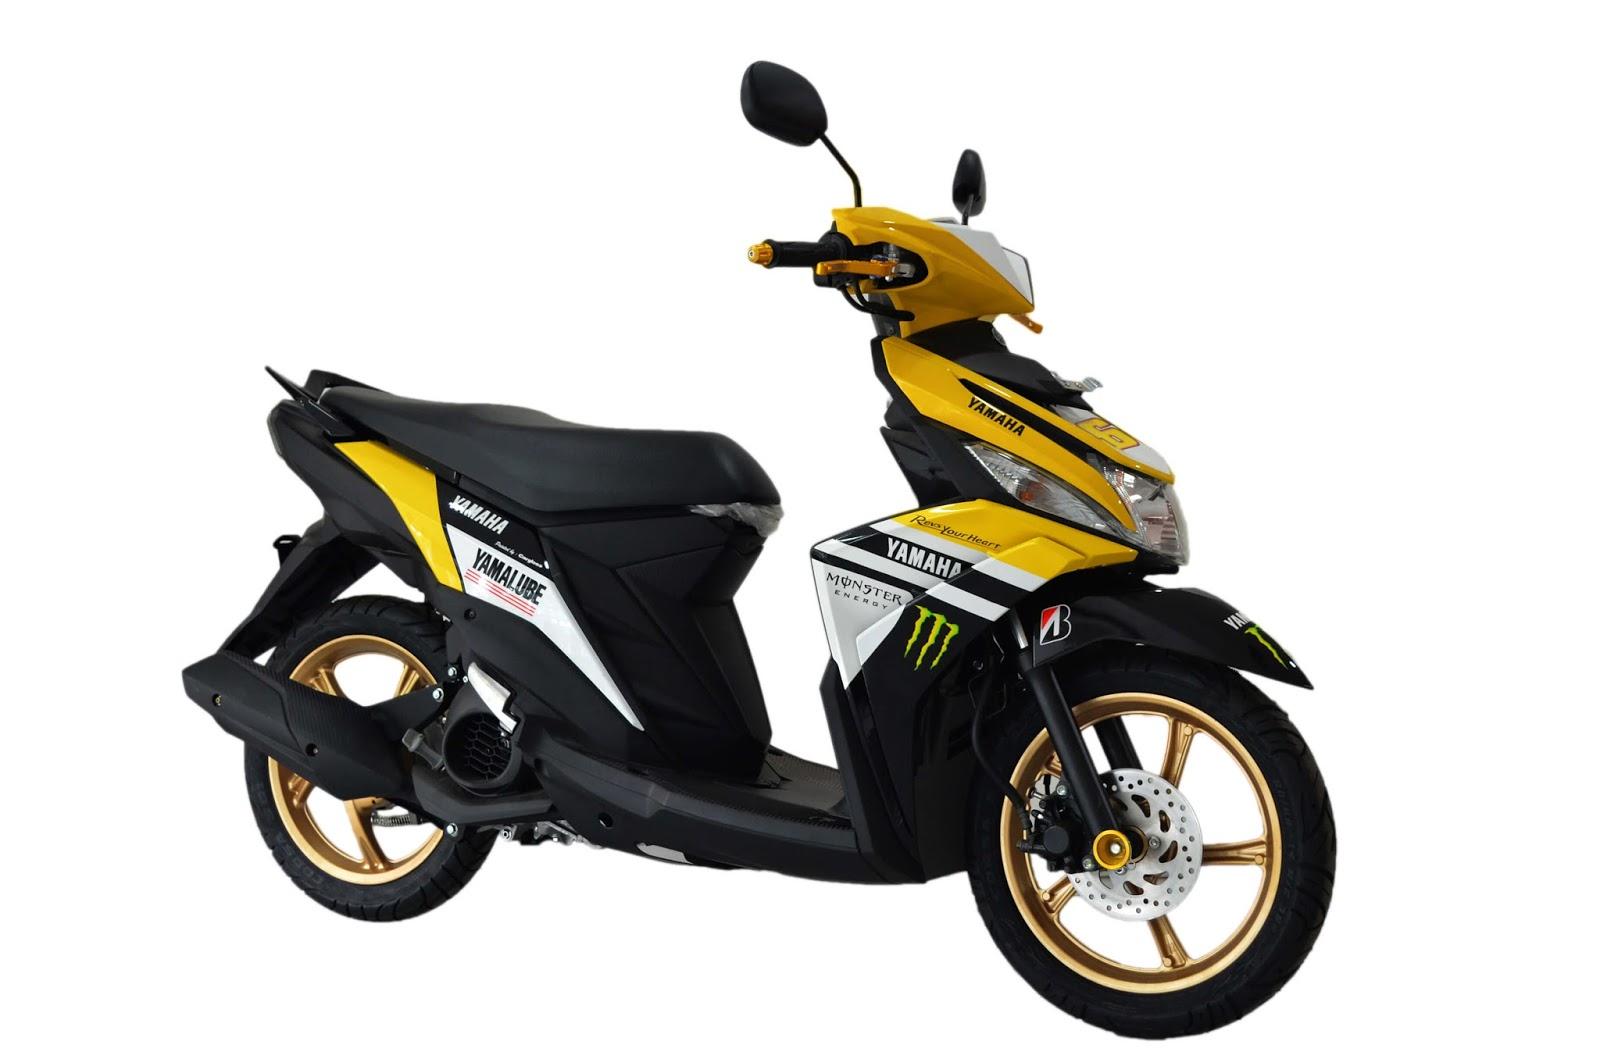 Yamaha Mio M3 125 Blue Core Custom Kuning Putih